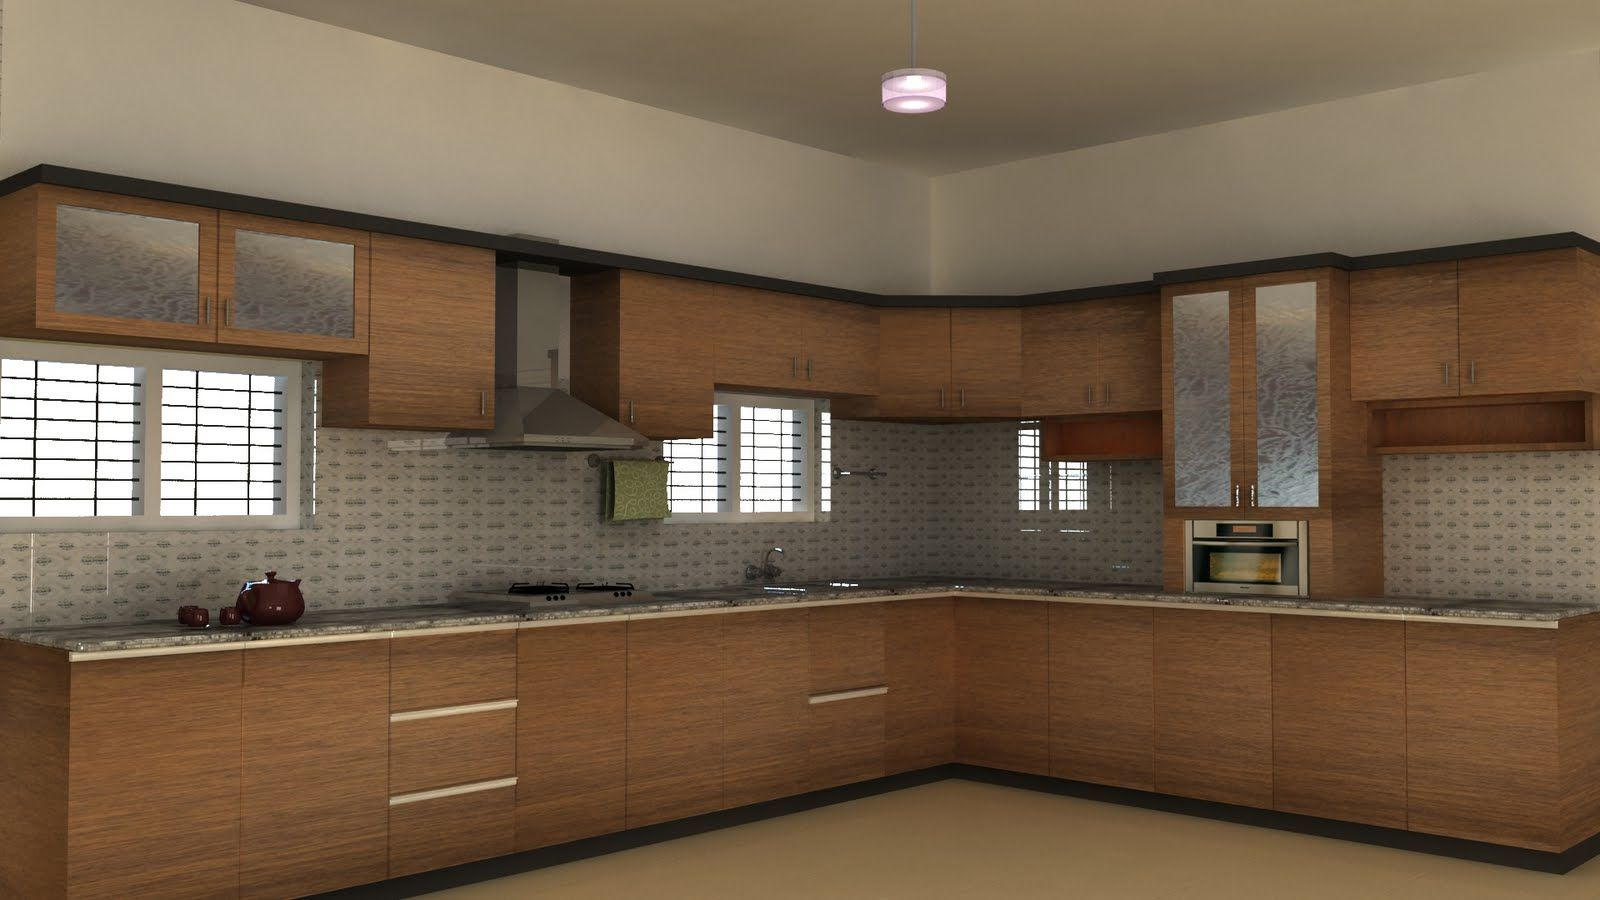 Kitchen Design Ideas Kerala kitchen interior design ideas kerala style | ideasidea